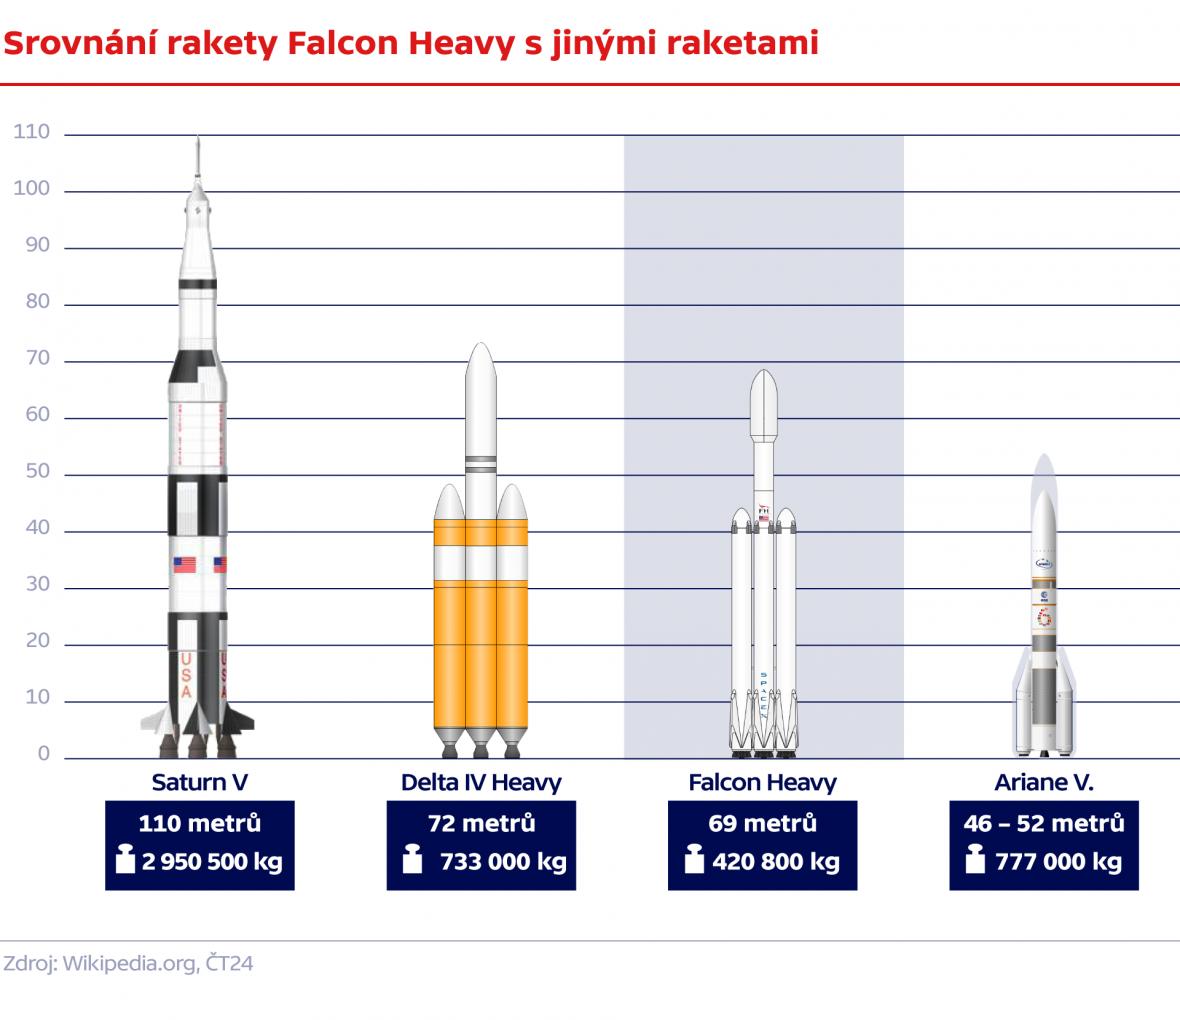 Srovnání rakety Falcon Heavy s jinými raketami